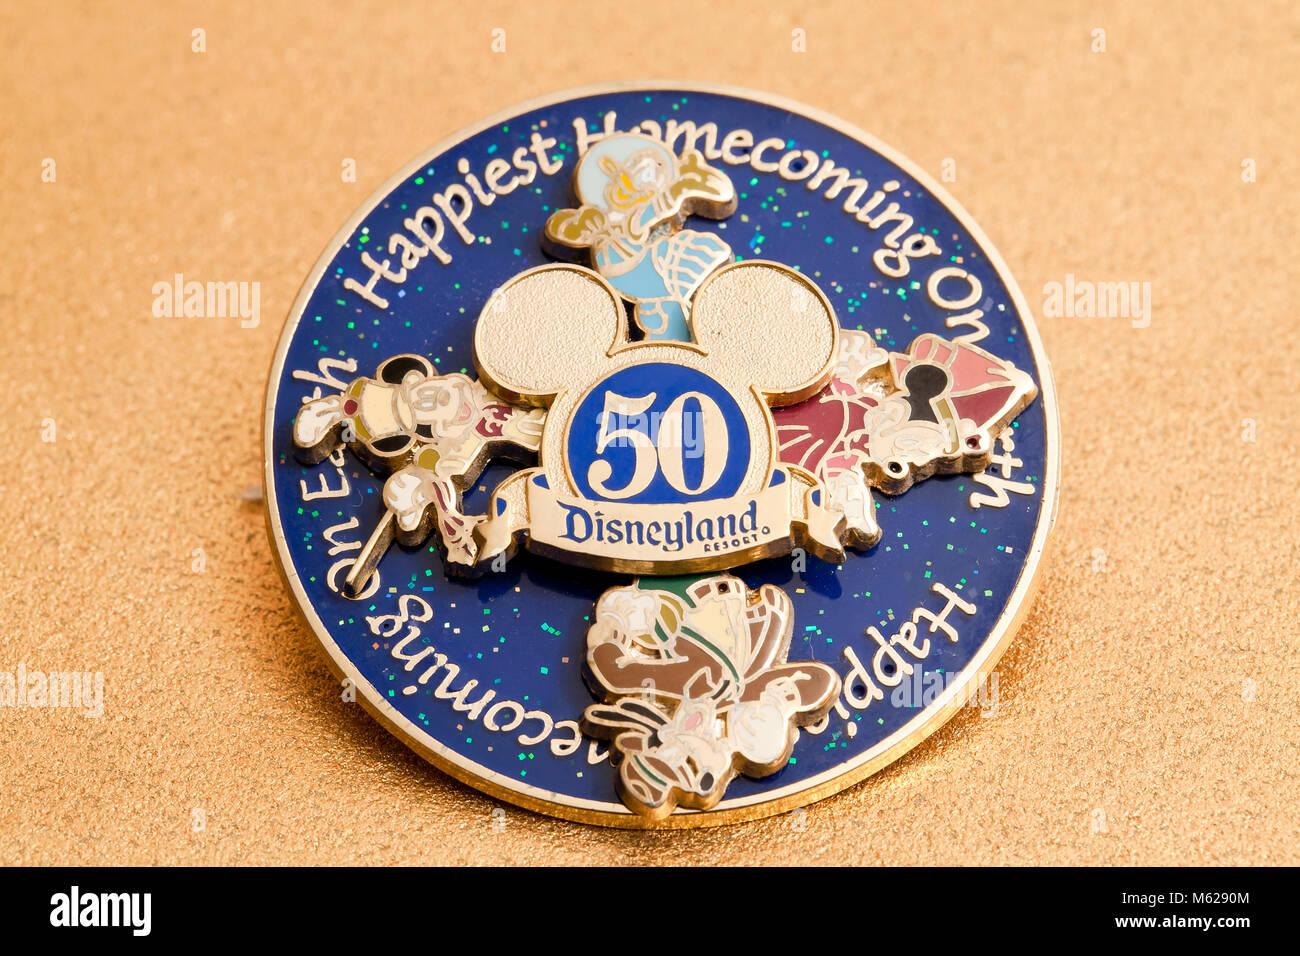 Disneyland 50th Anniversary souvenir - USA - Stock Image